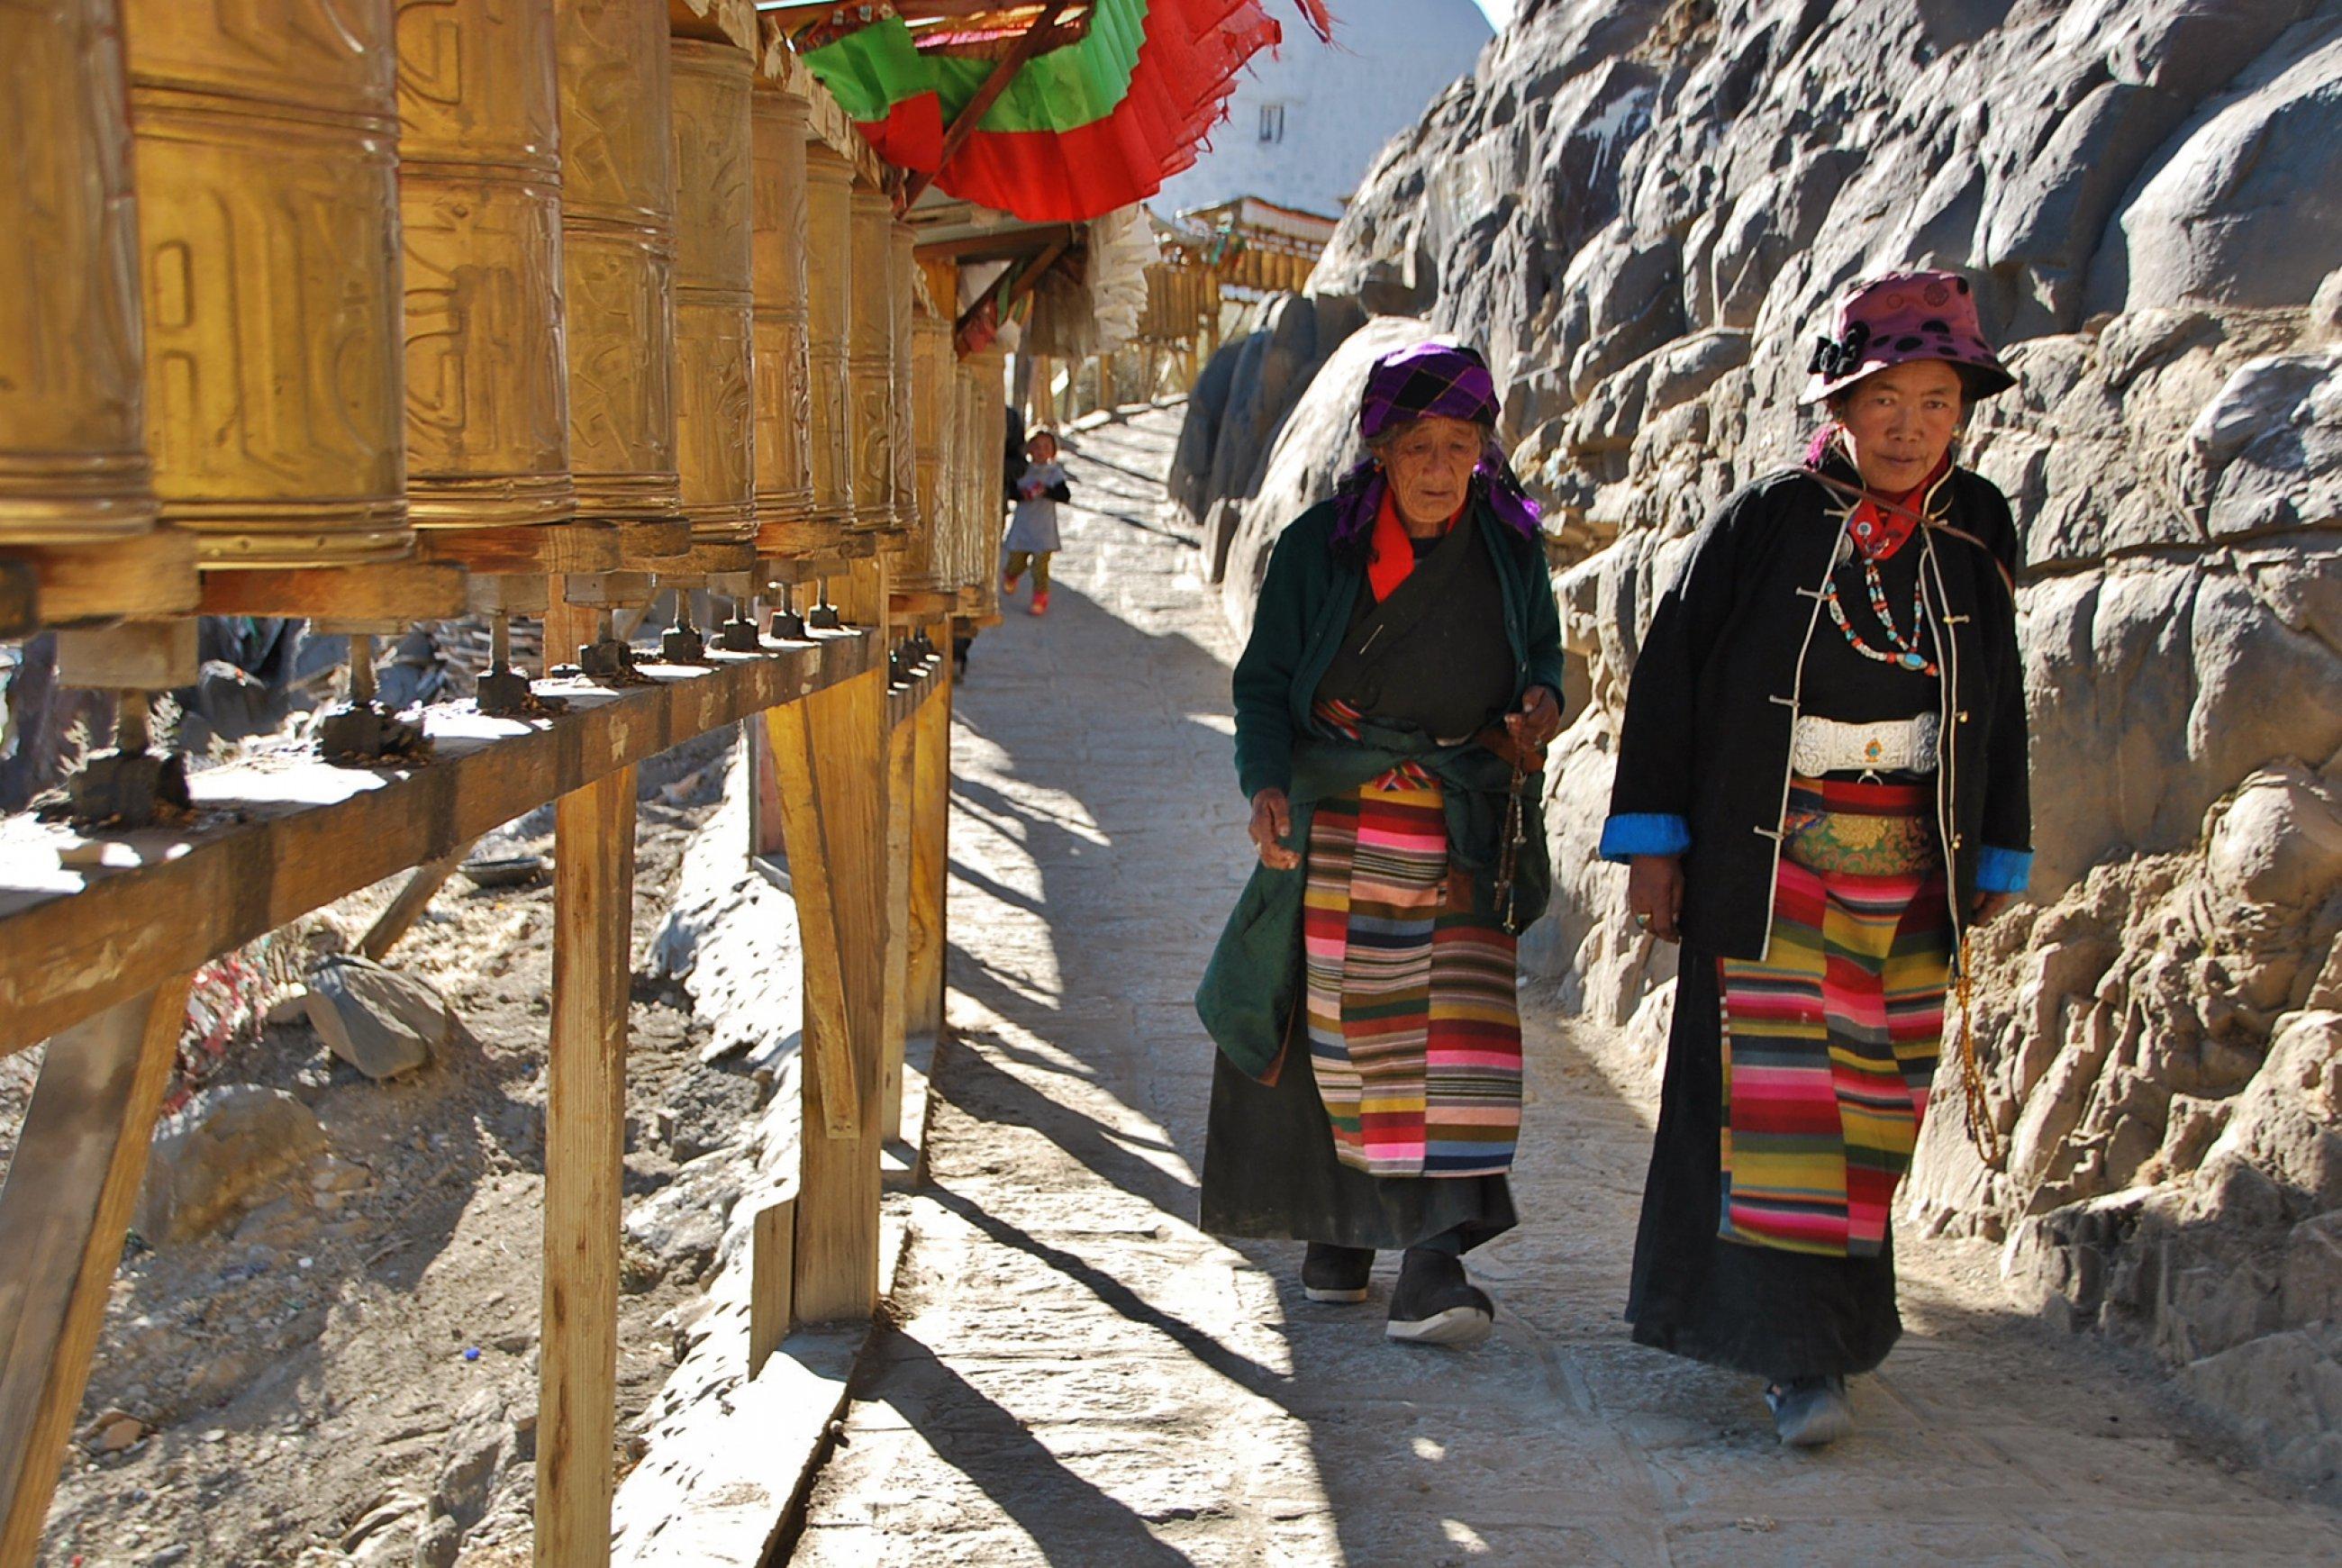 https://bubo.sk/uploads/galleries/16317/tibet-ctni-11-2014-mirka-sulka-278-.jpg